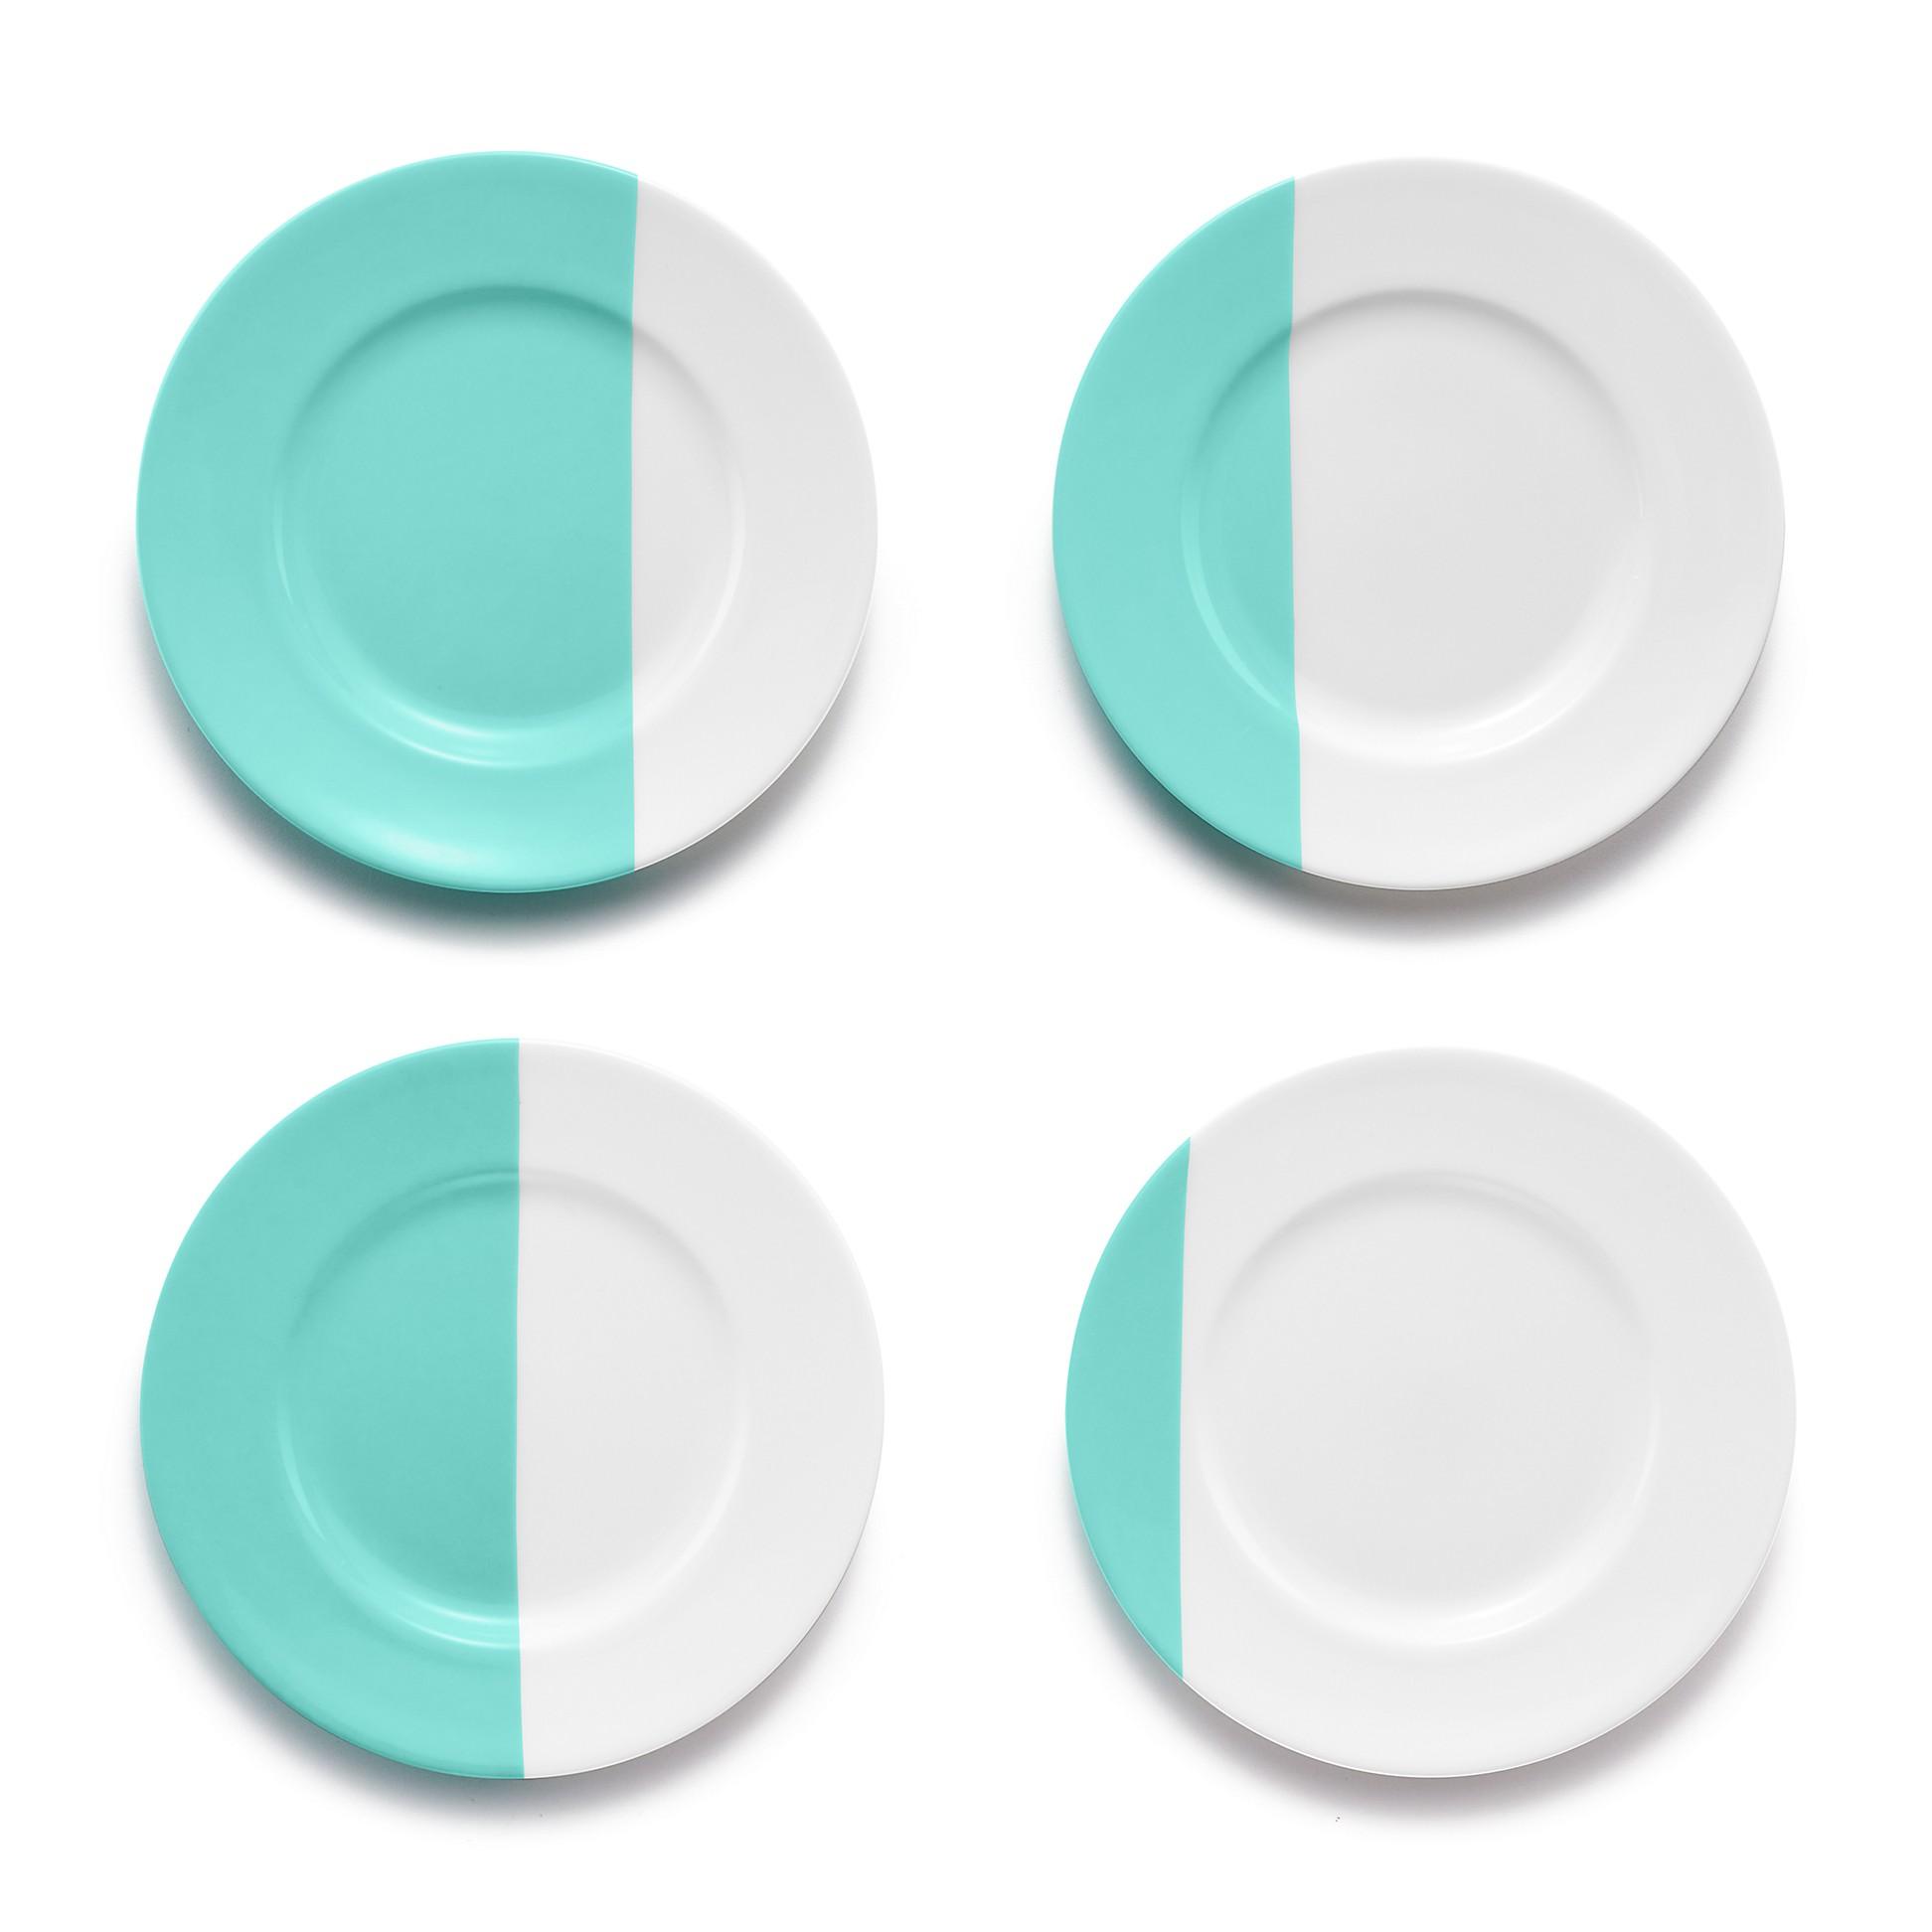 Color Block        Cocktail Plates by Color Block